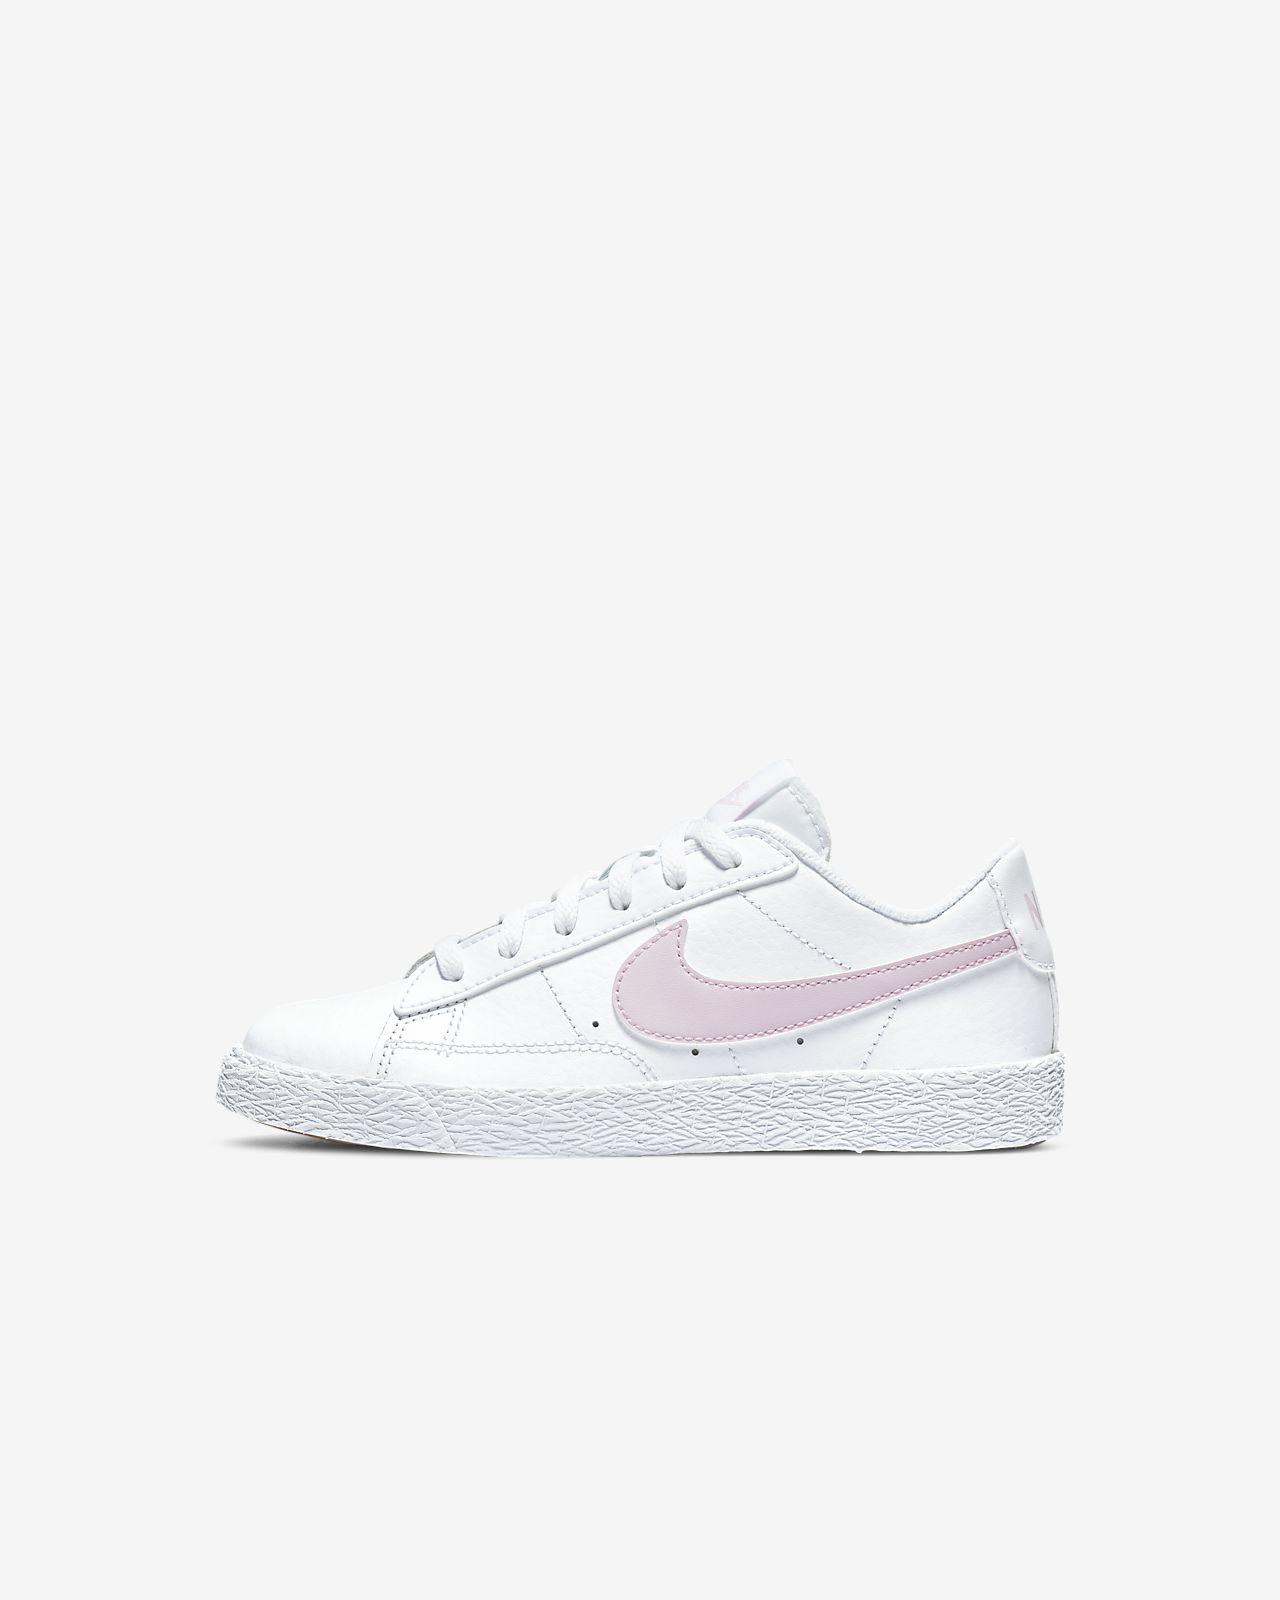 Nike Blazer Low Zapatillas - Niño/a pequeño/a